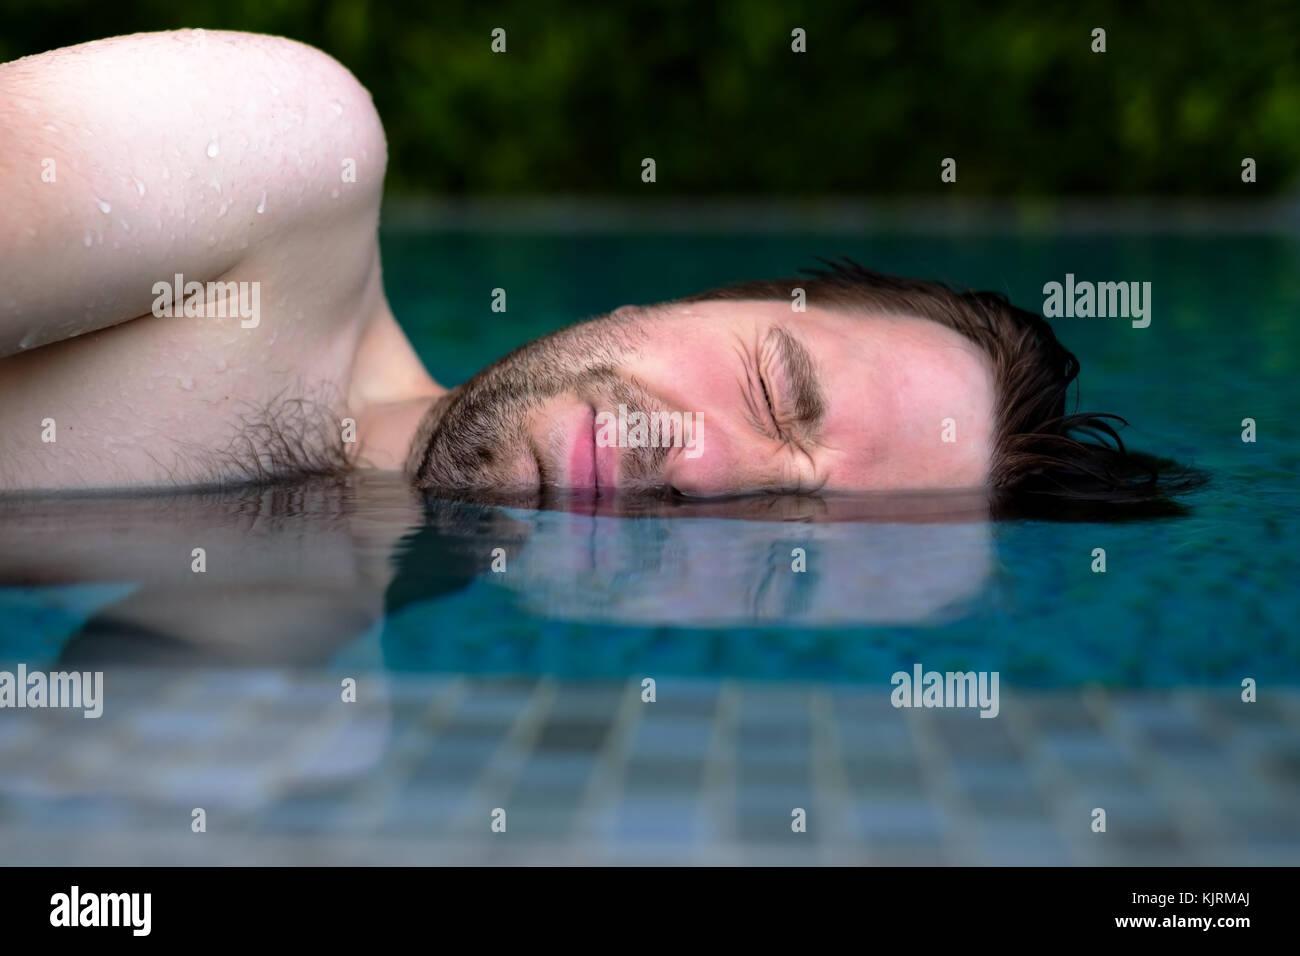 Chlorine Water Stock Photos Chlorine Water Stock Images Alamy